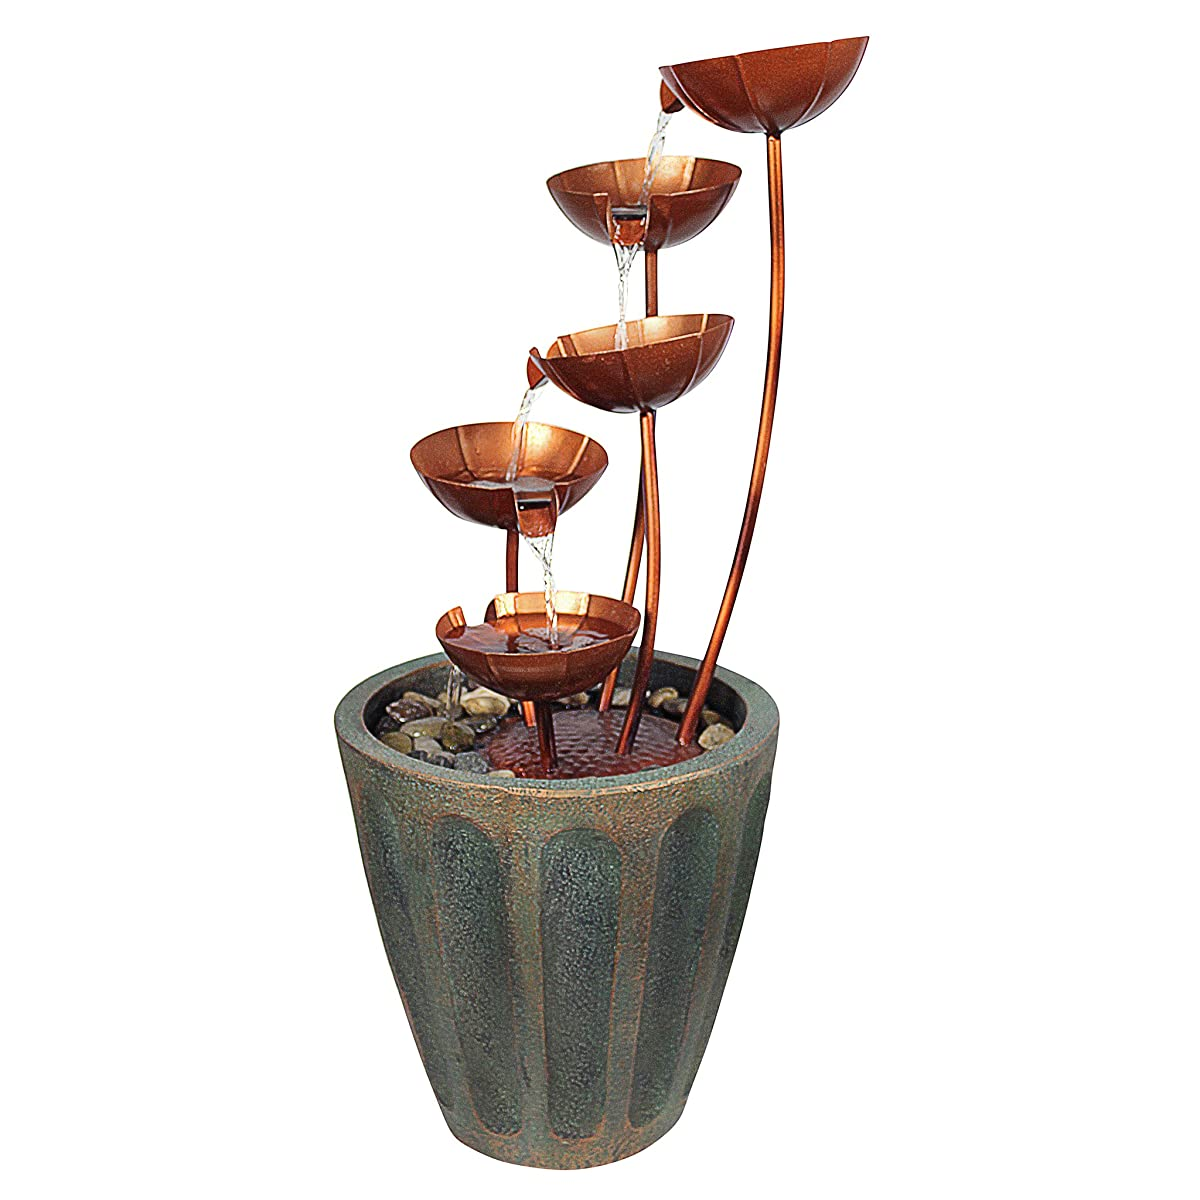 Design Toscano Copper Falls Water Fountain Garden Decor Outdoor Water Feature, 33 Inch, Polyresin, Copper Finish